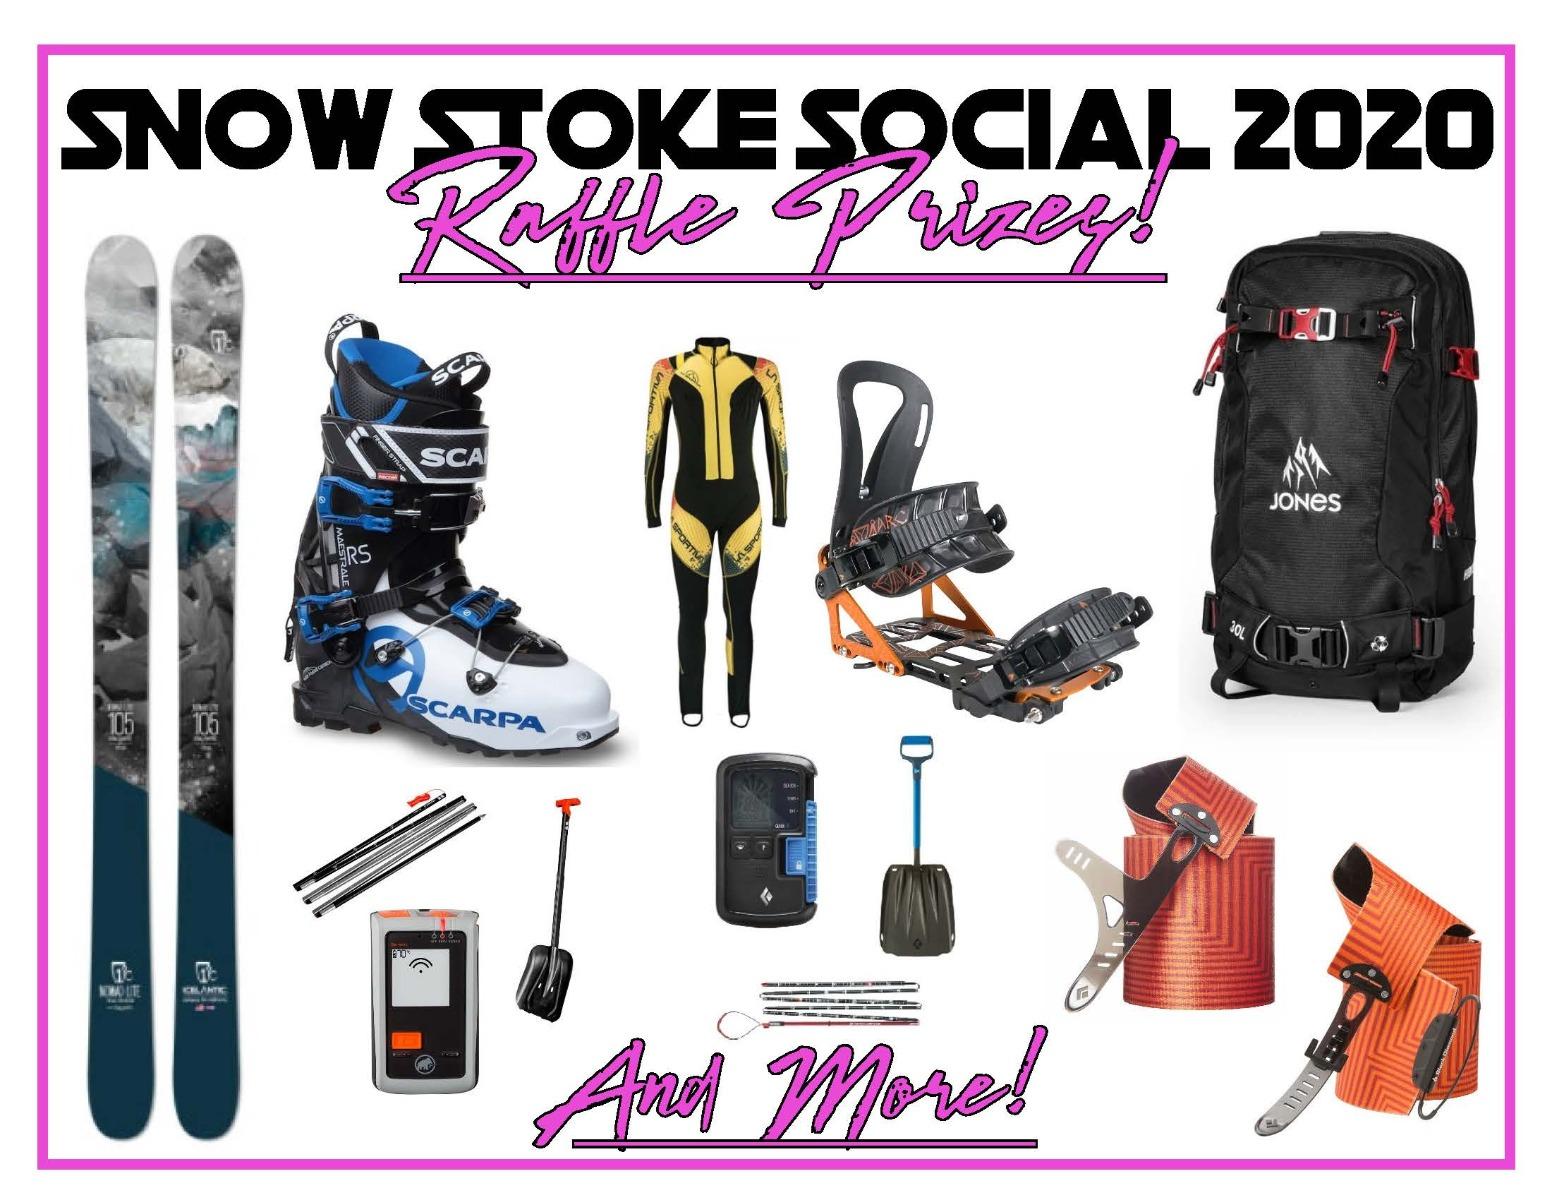 Snow Stoke Social 2020 Raffle Prizes